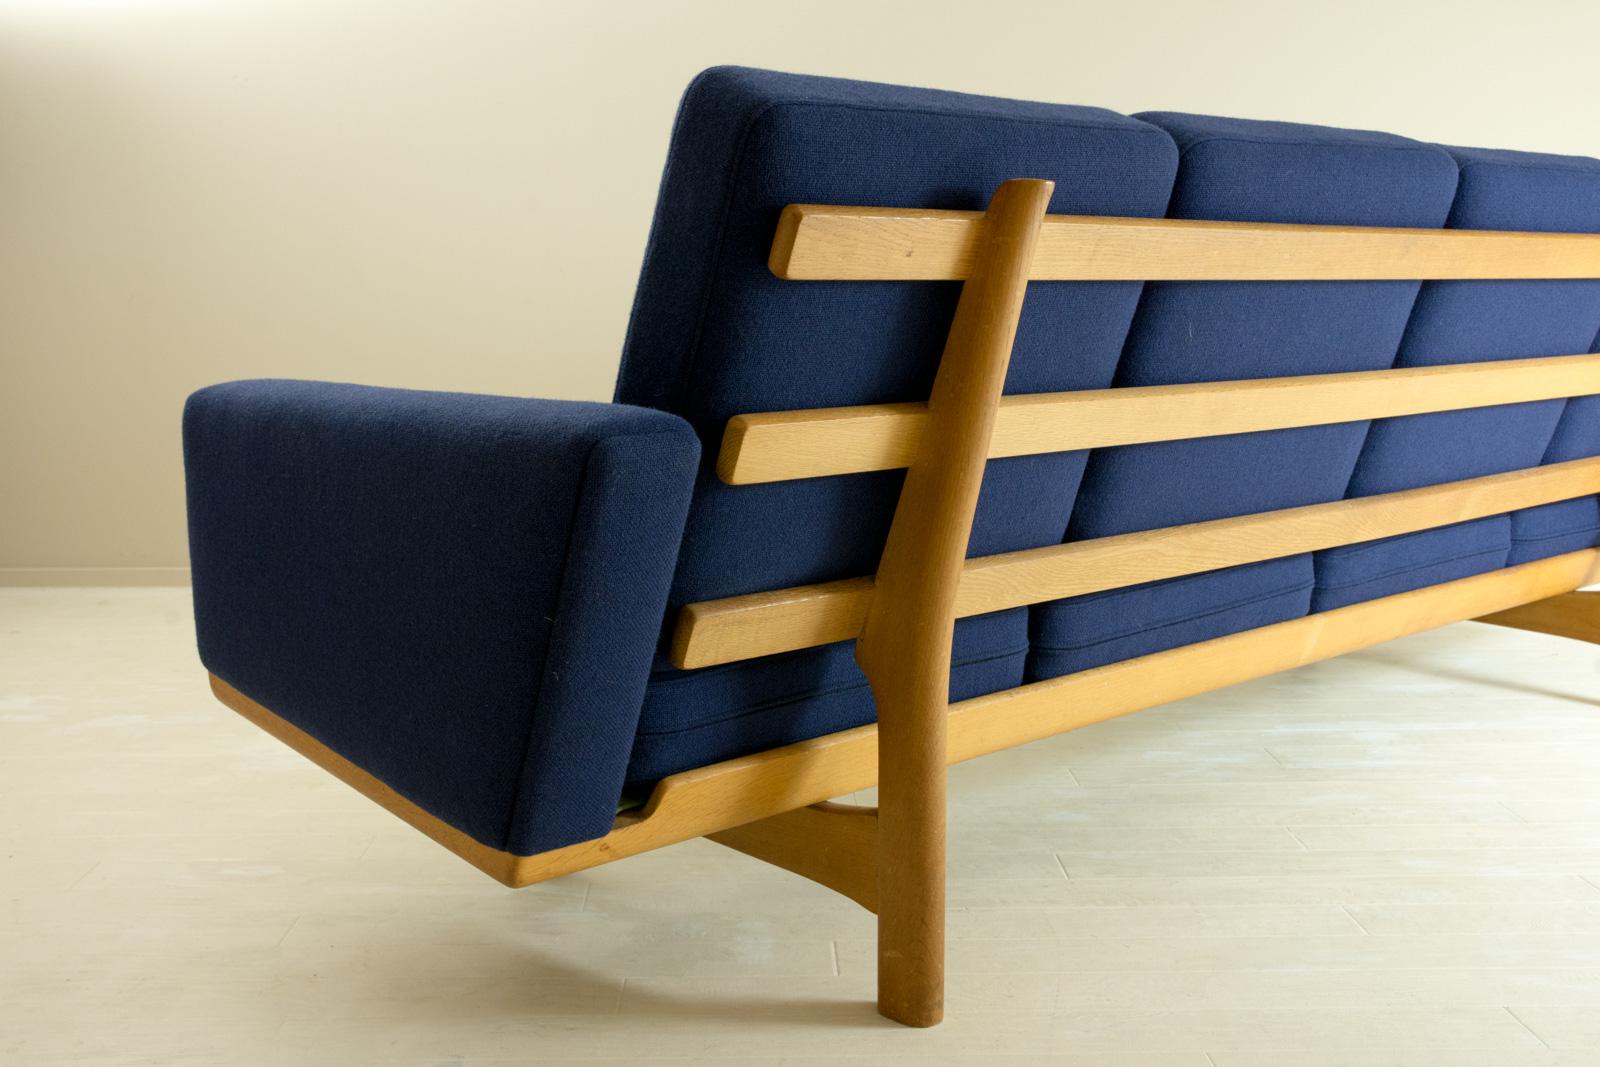 GE235 Sofa by Hans J Wegner